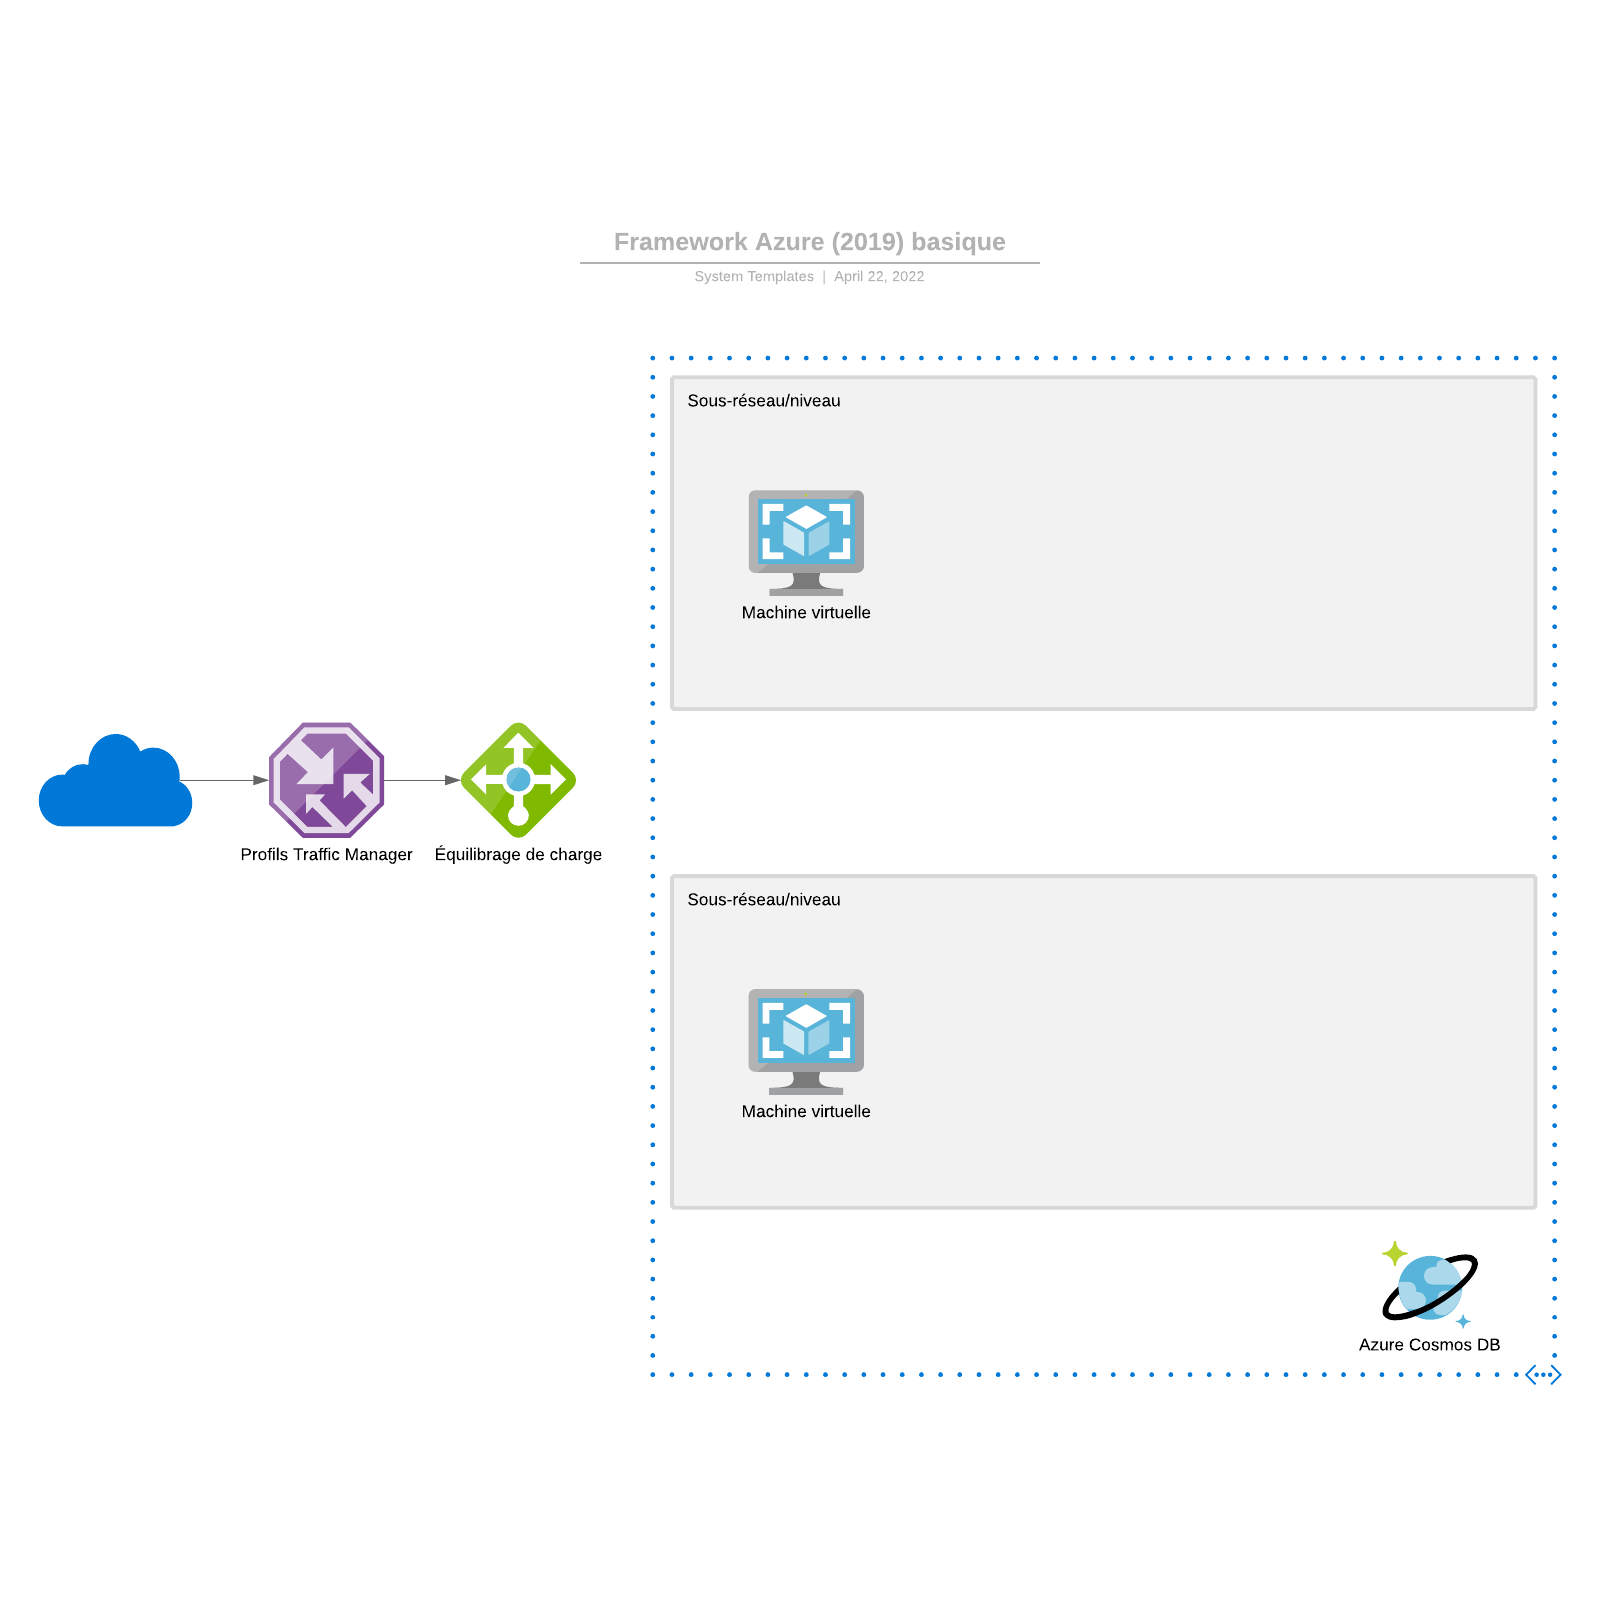 exemple de Framework Azure (2019) basique